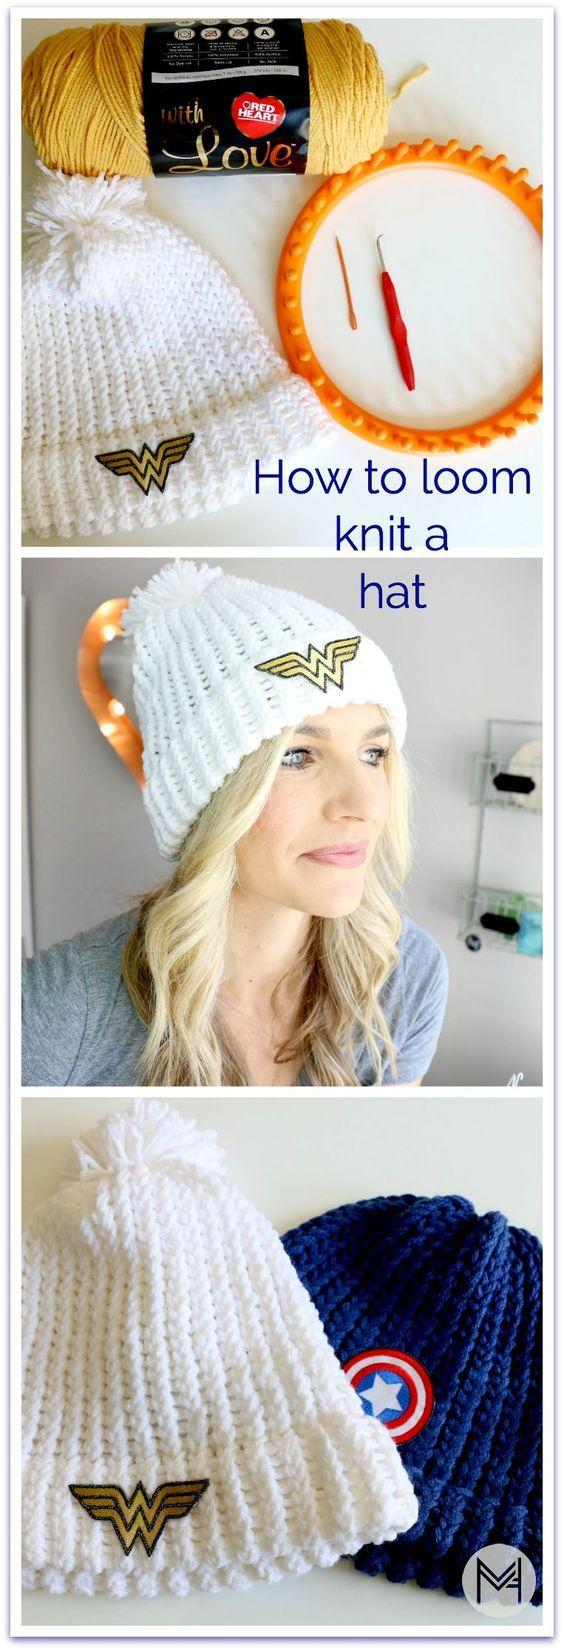 Loom knit hat tutorial! Step by Step instructions anyone can follow www.melaniekham.com